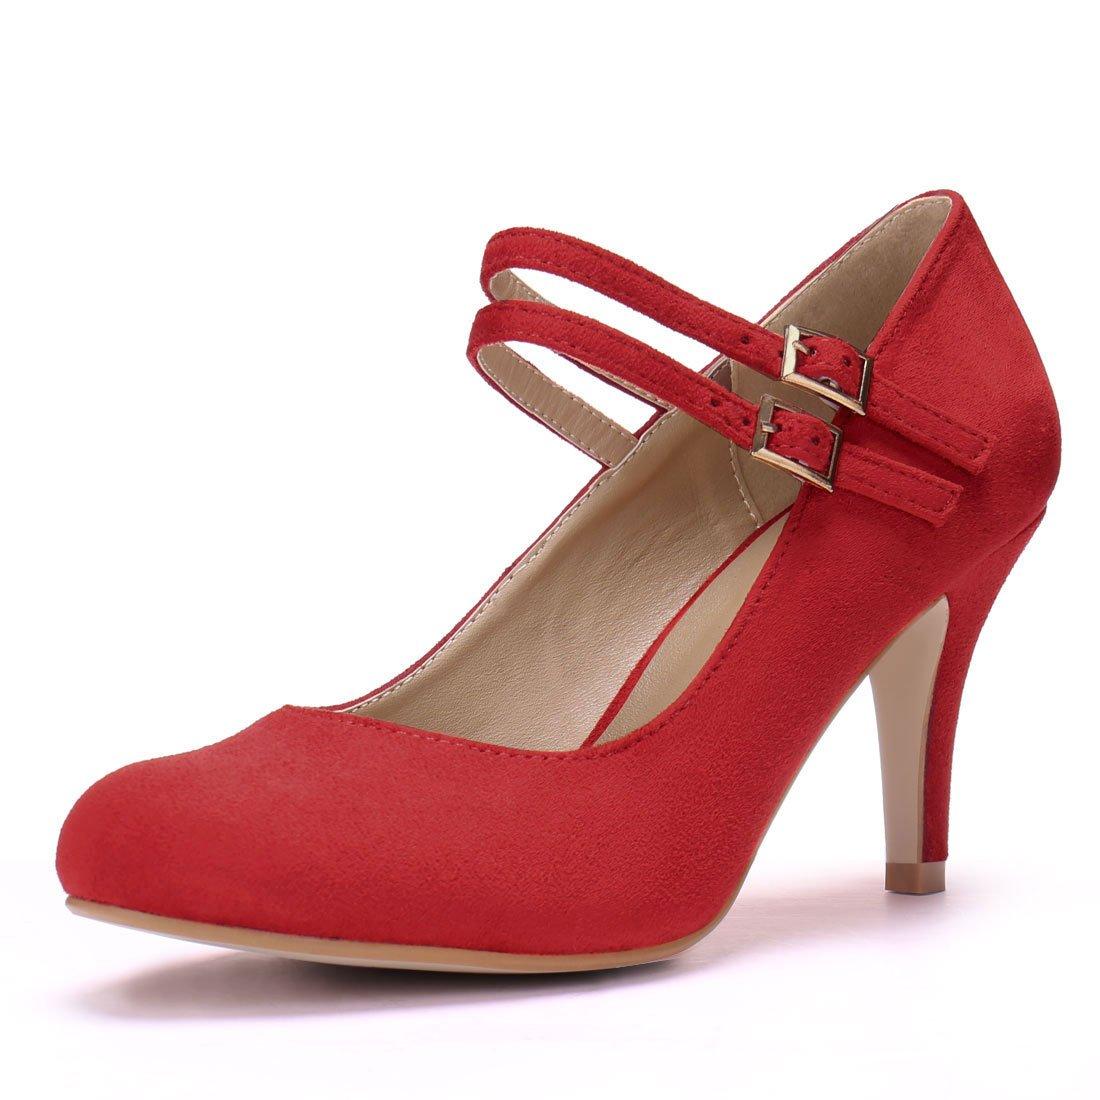 Allegra K Women's Stiletto Heel Mary Jane Pumps a17042200ux0749